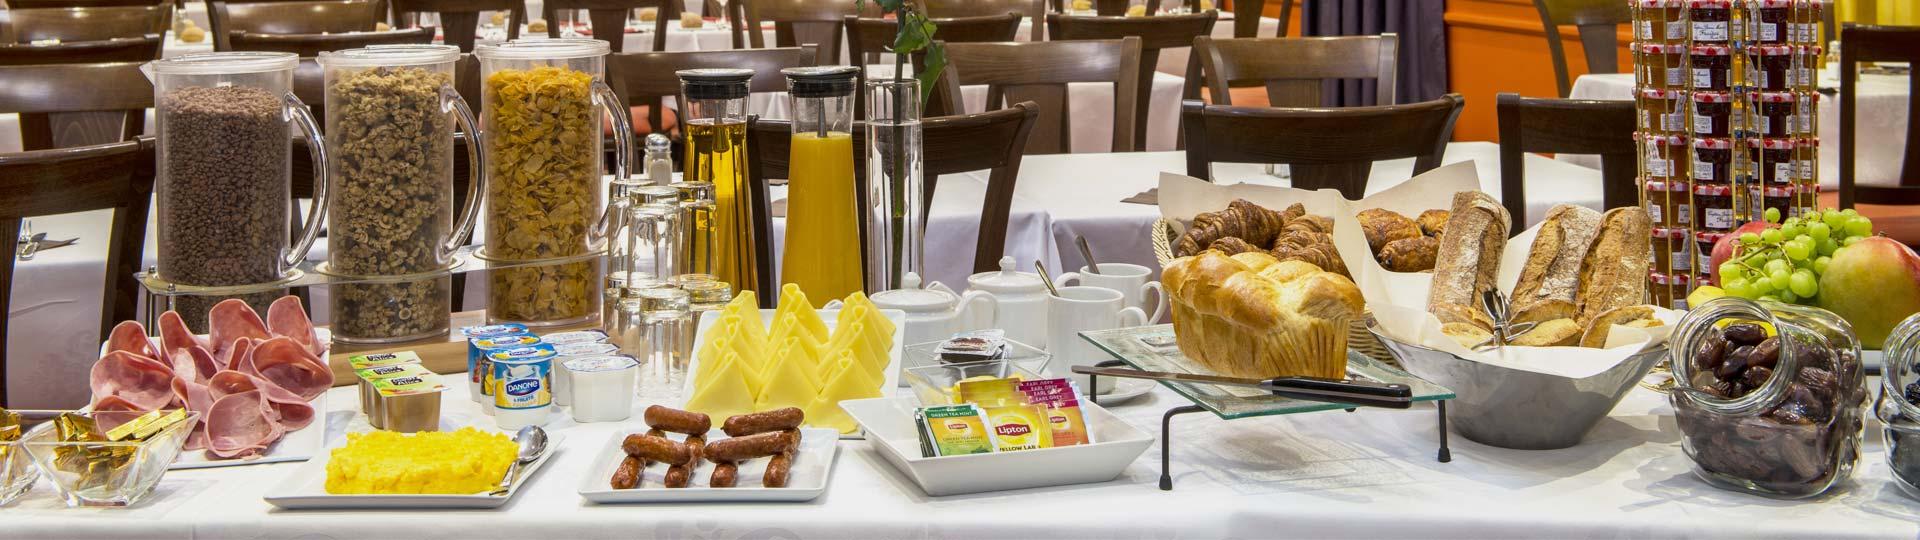 Petit déjeuner - restaurant hotel Provinces Opéra